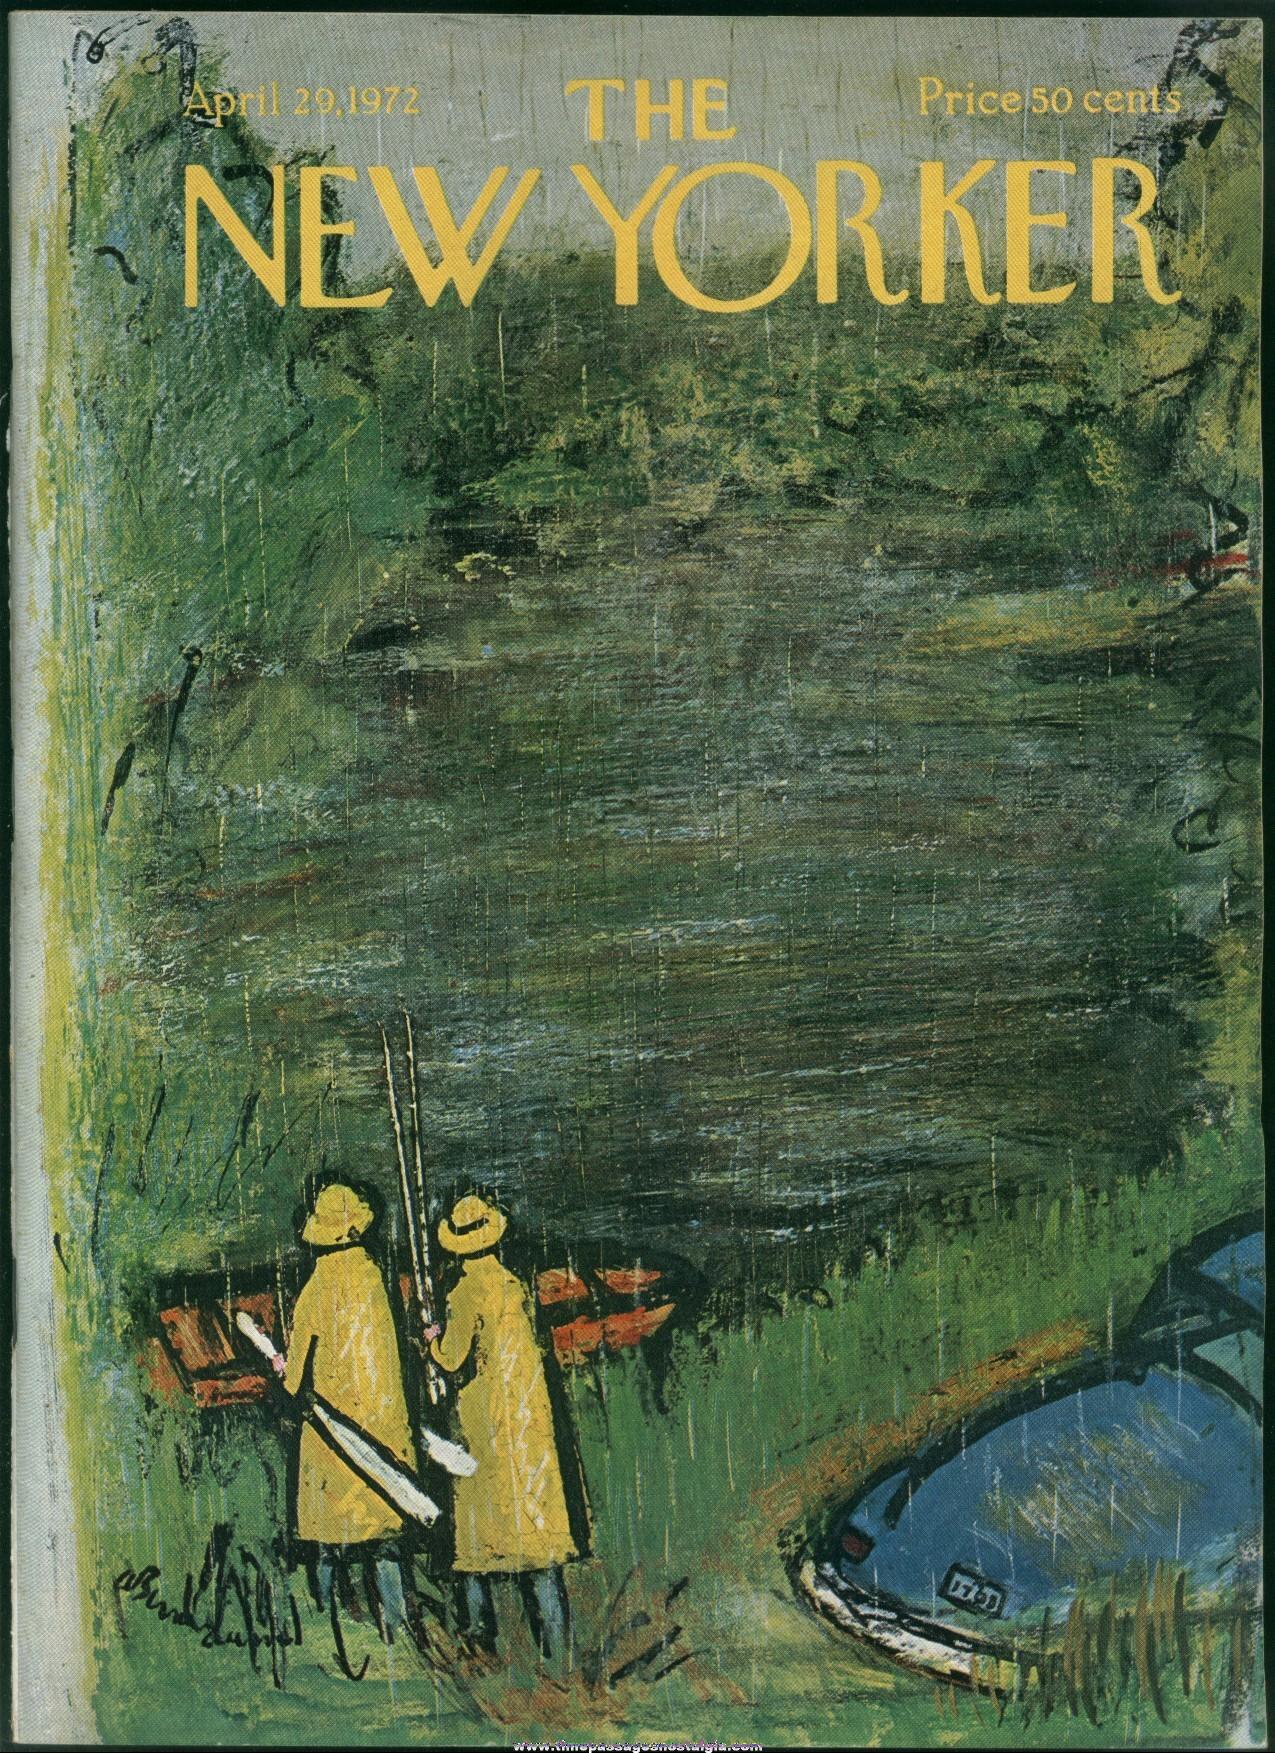 New Yorker Magazine - April 29, 1972 - Cover by Abe Birnbaum